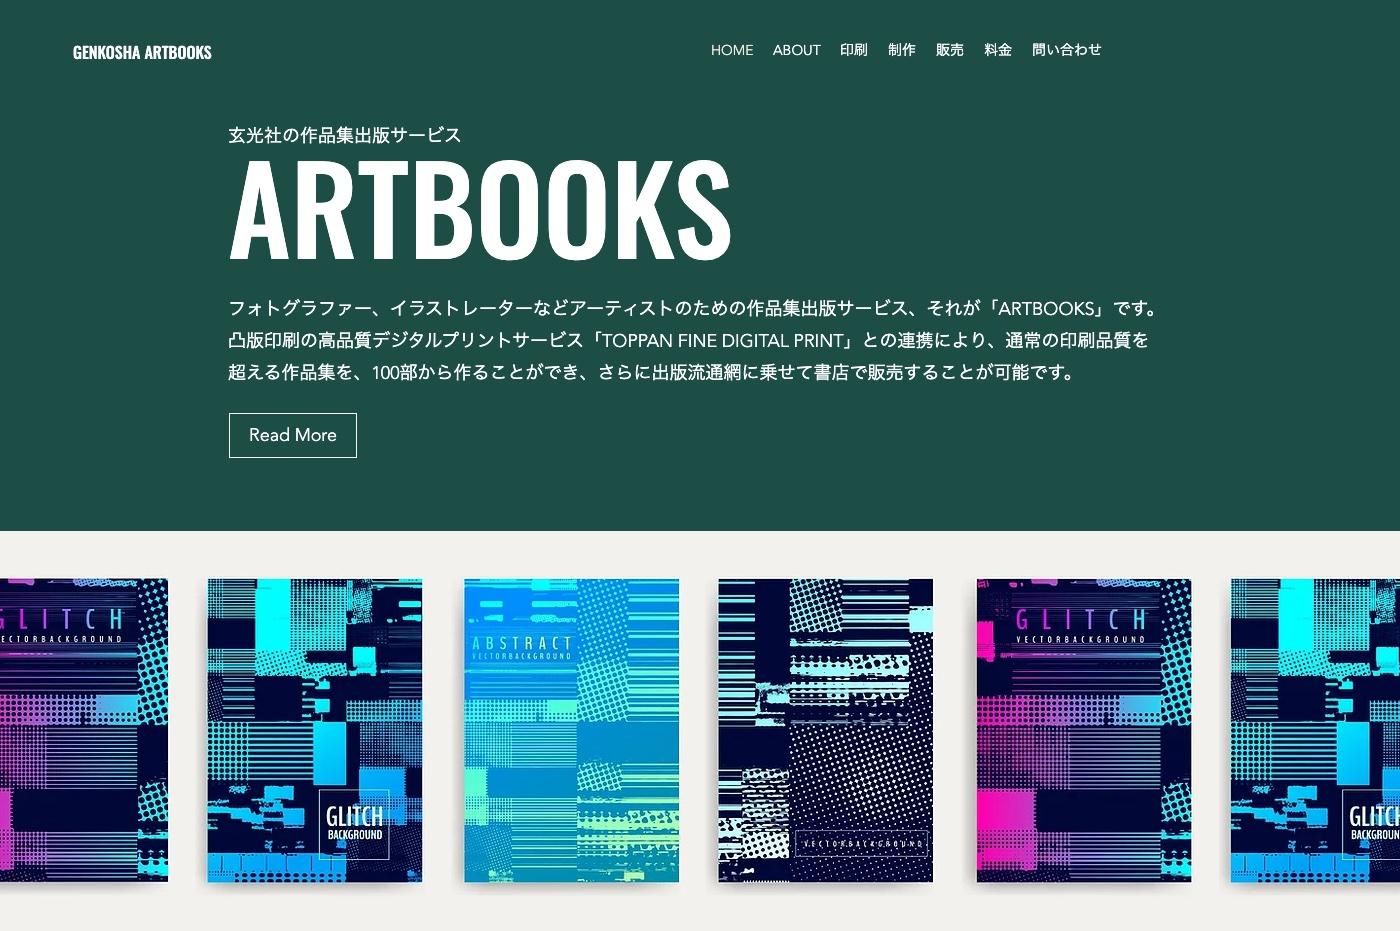 tfdp_artbooks.jpg